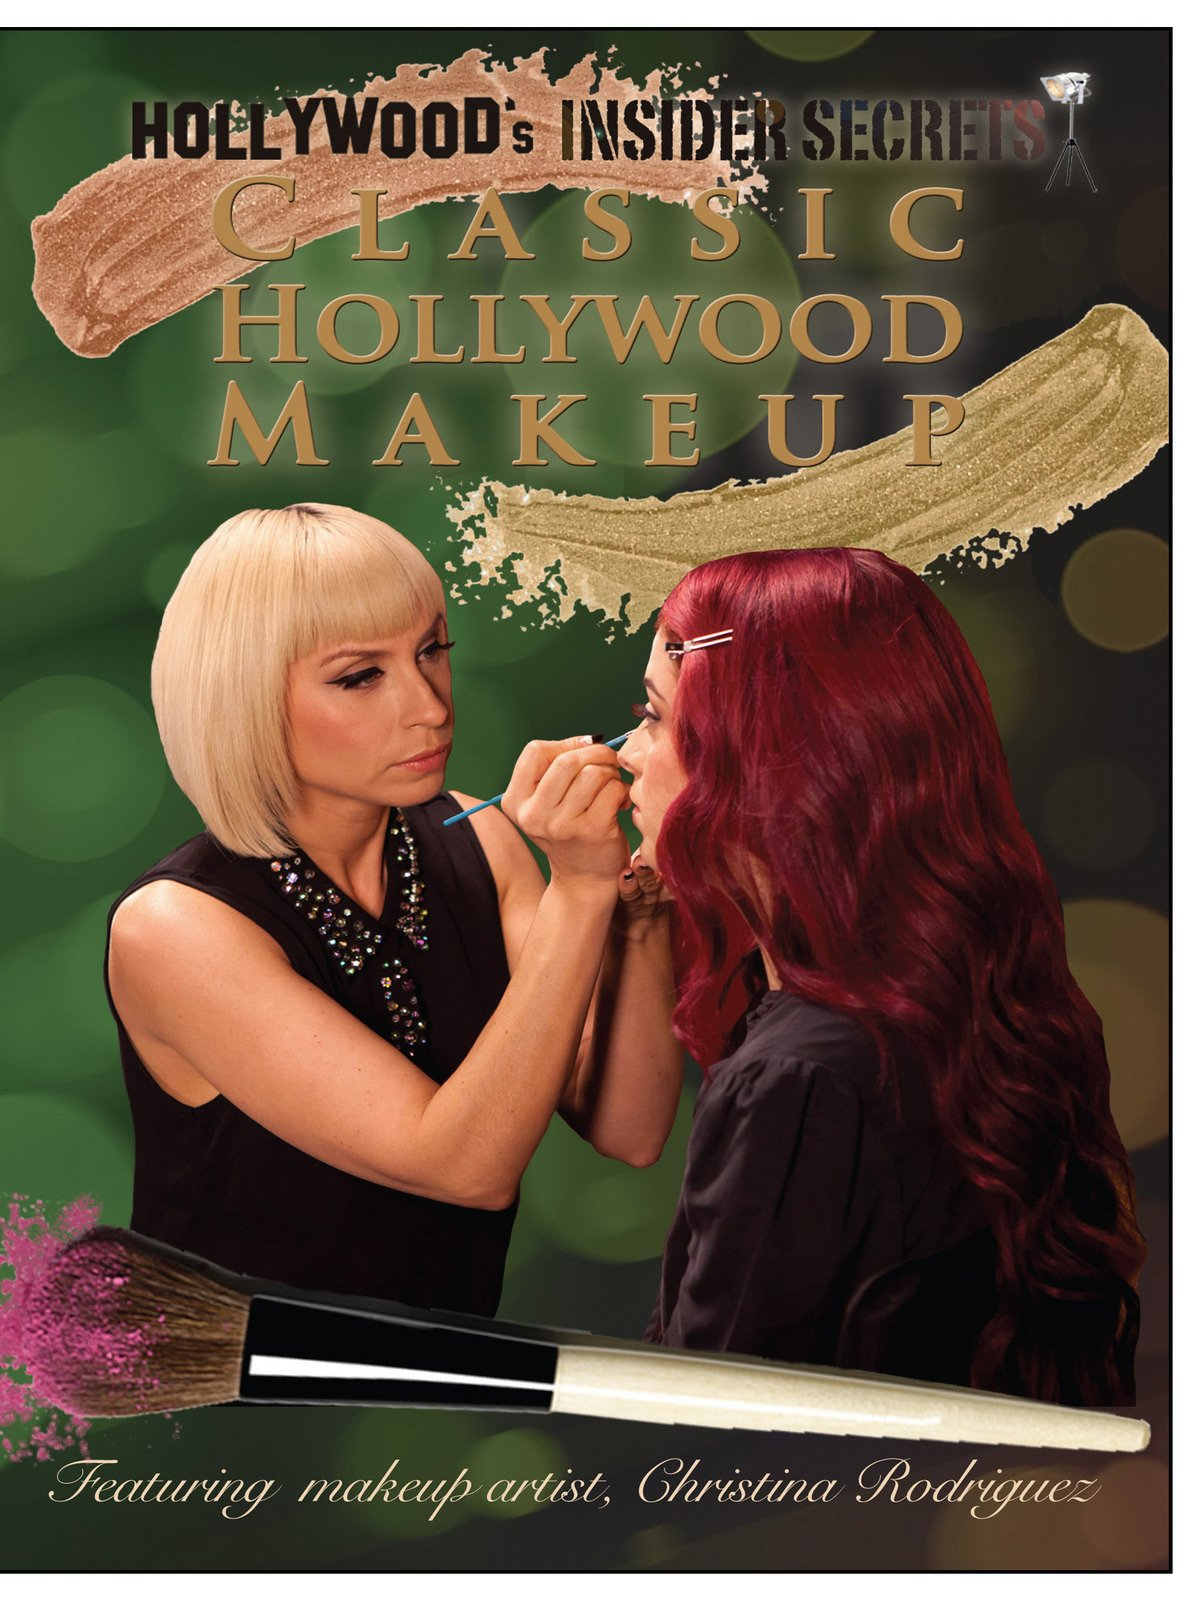 Hollywood's Insider Secrets